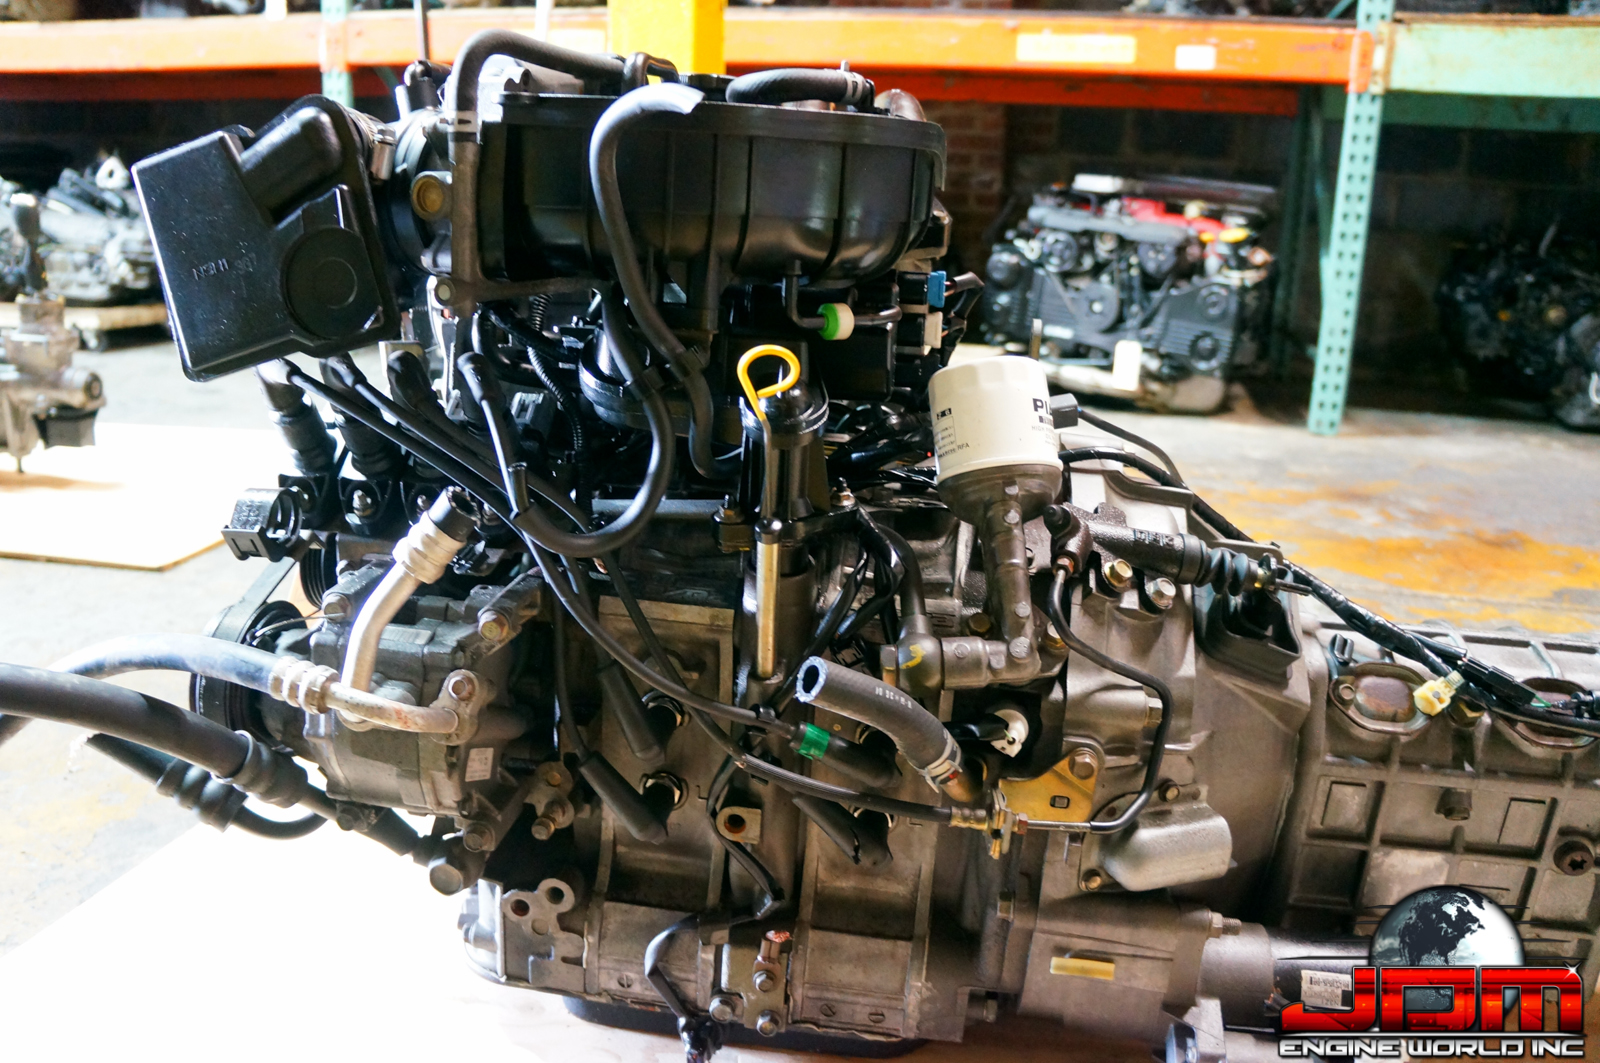 JDM 13B RX8 ENGINE 4 PORT WITH 5 SPEED TRANSMISSION